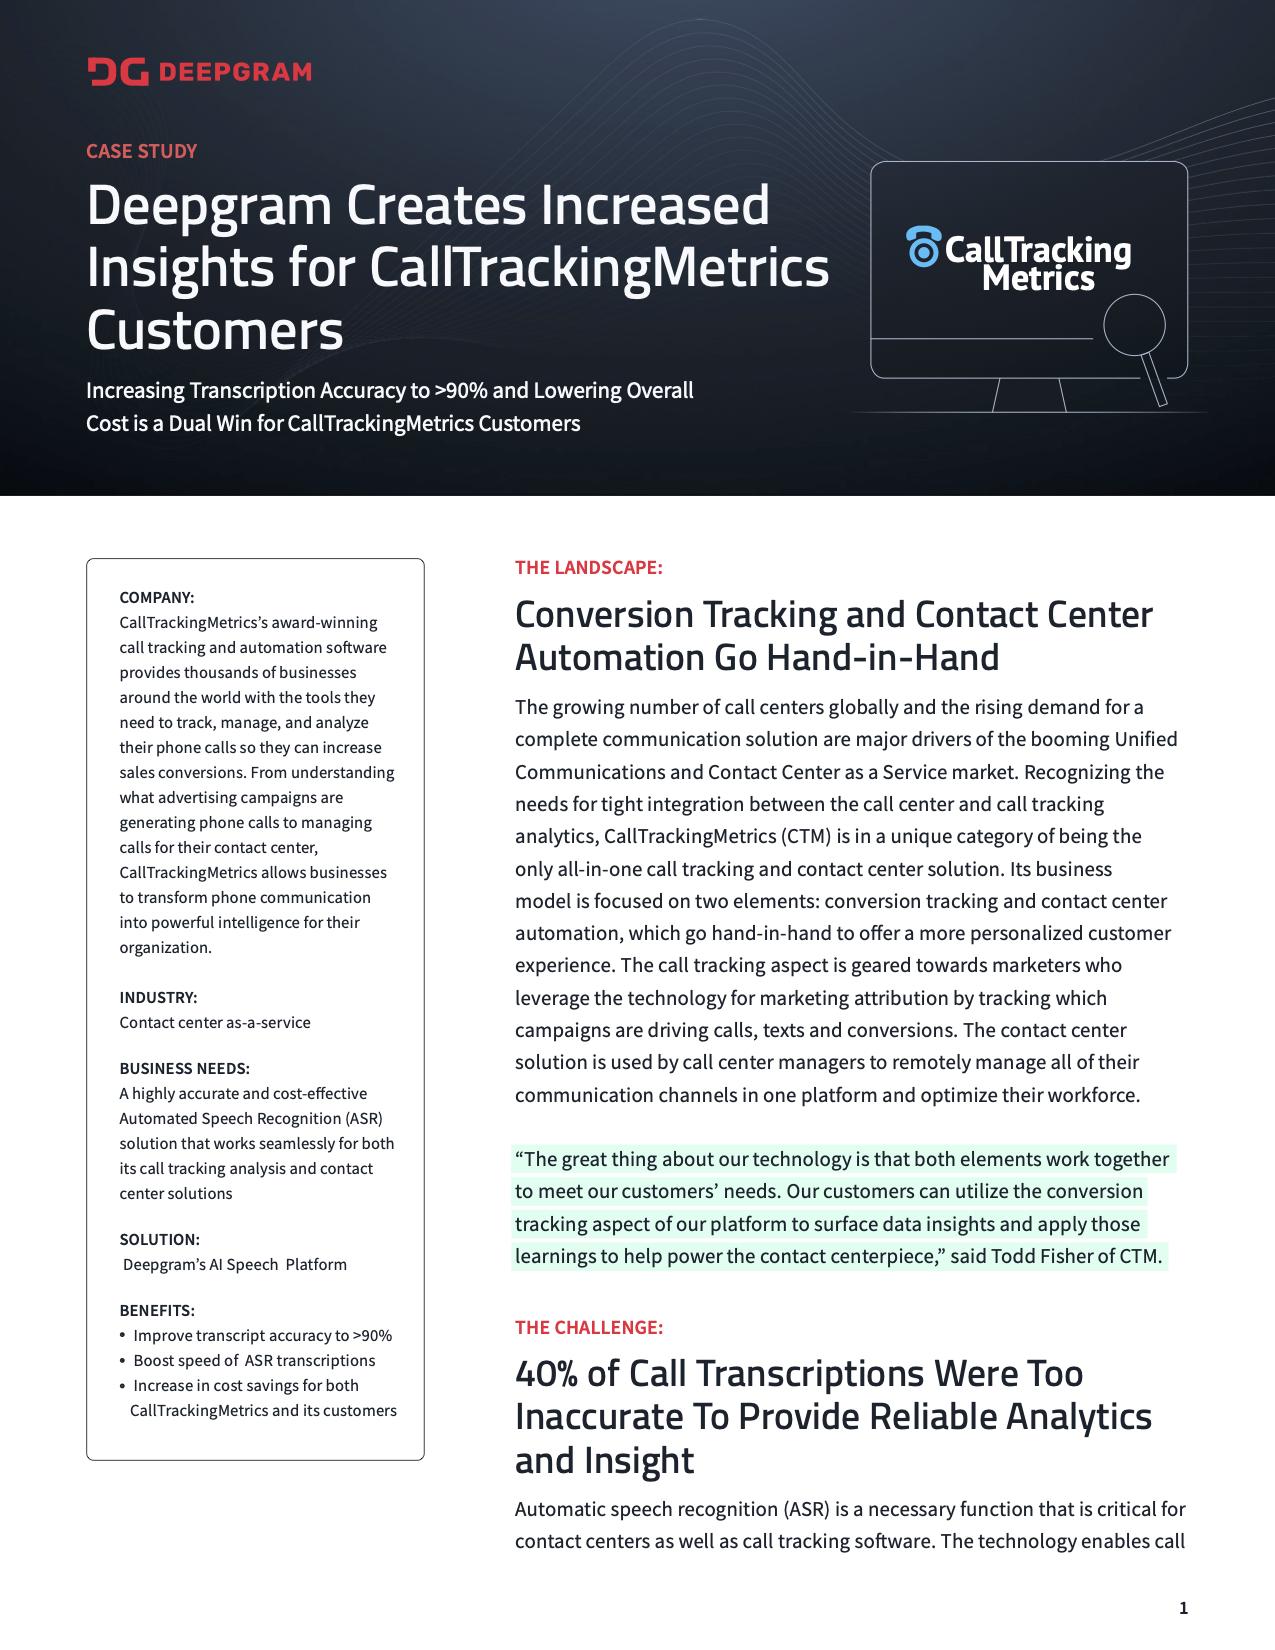 CallTrackingMetrics case study